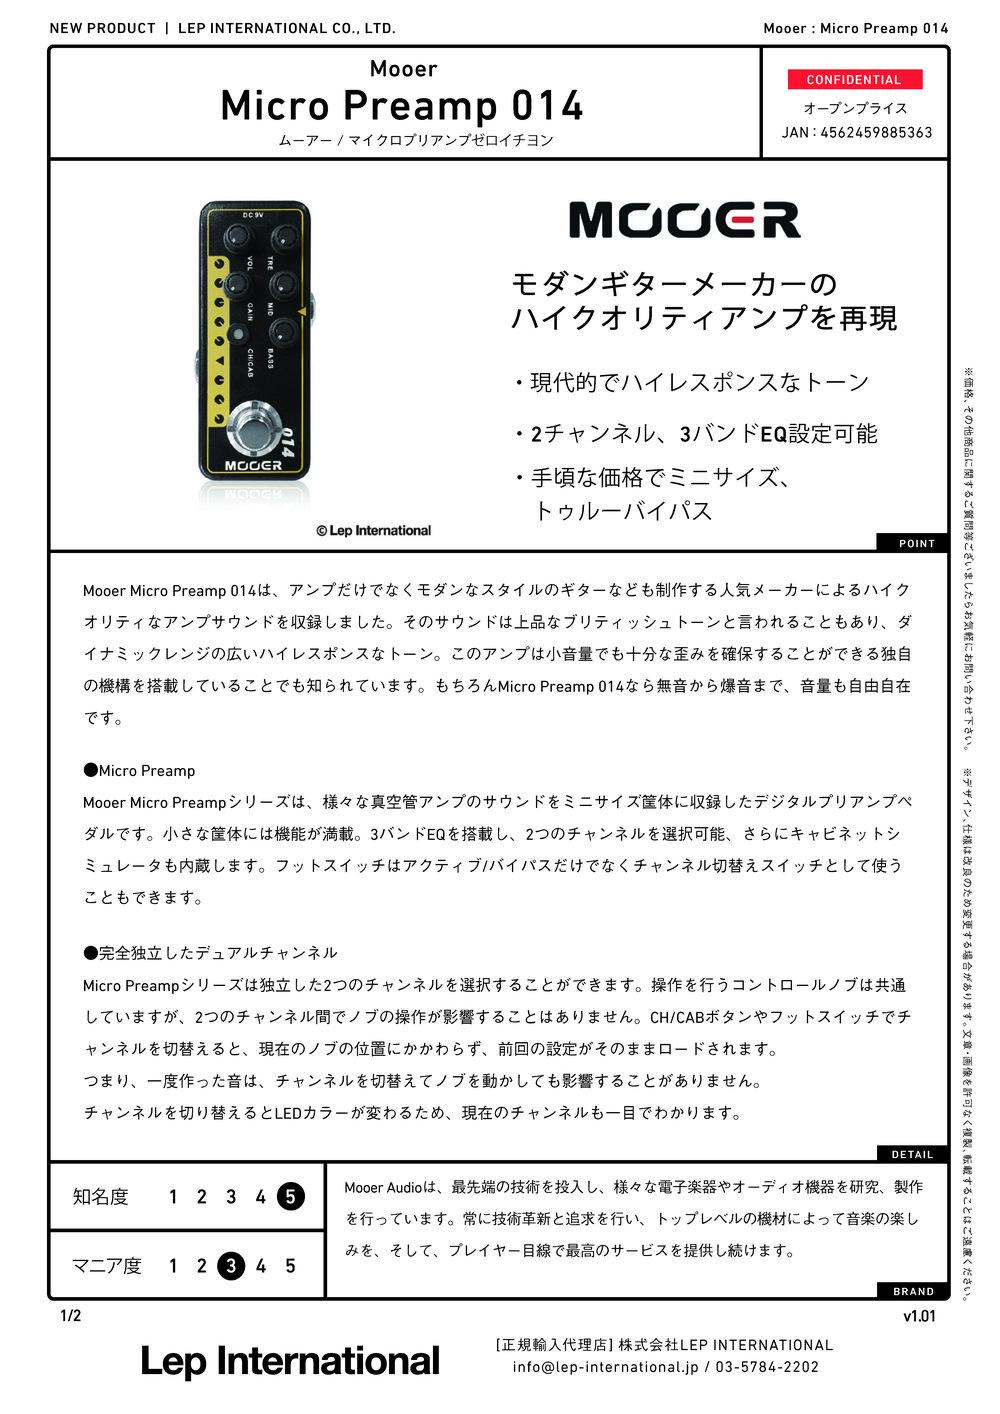 mooer micropreamp014 v1.01_ページ_1.jpg